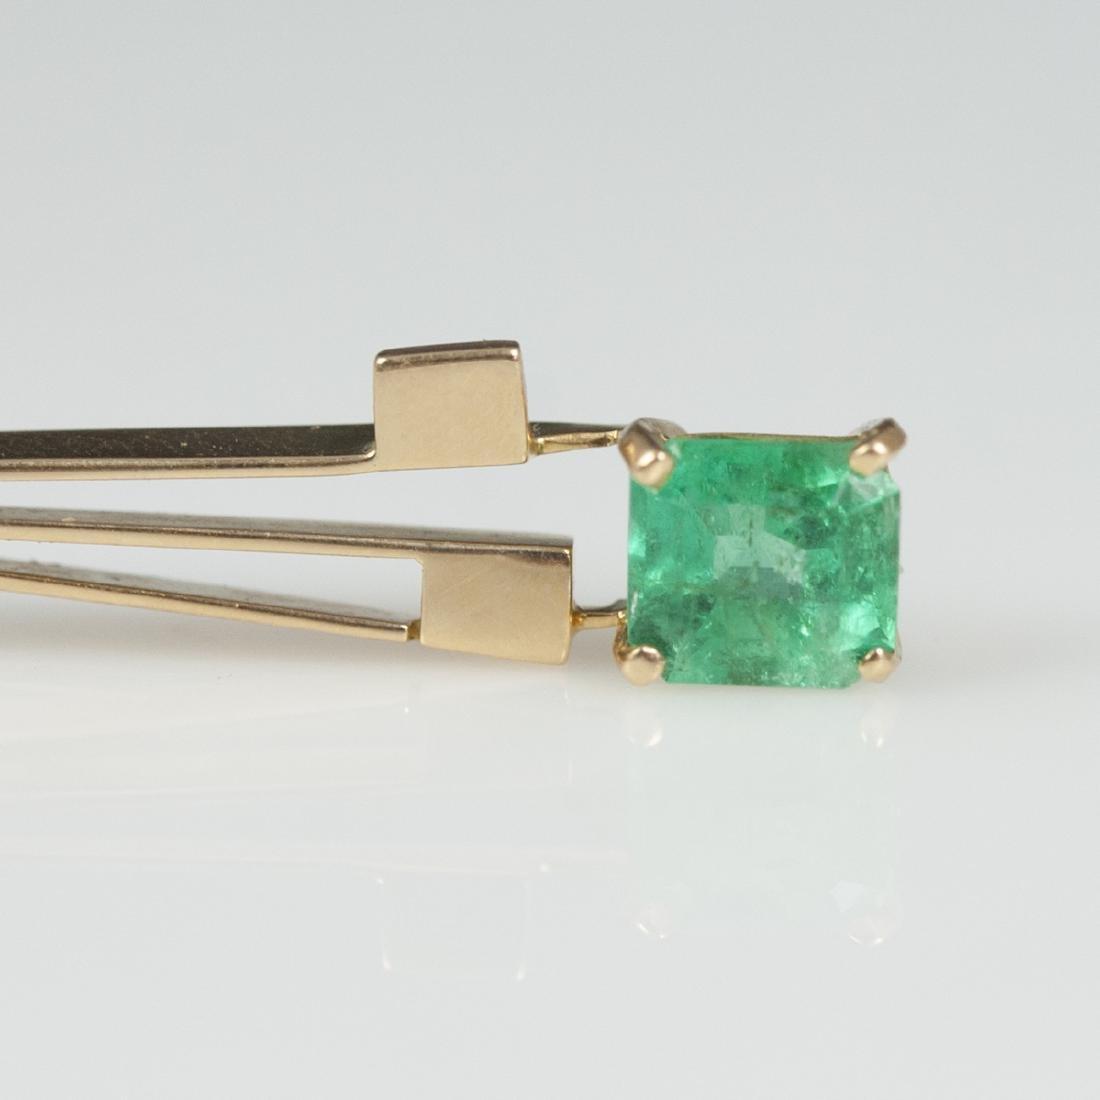 18kt Gold & Emerald Pendant - 2